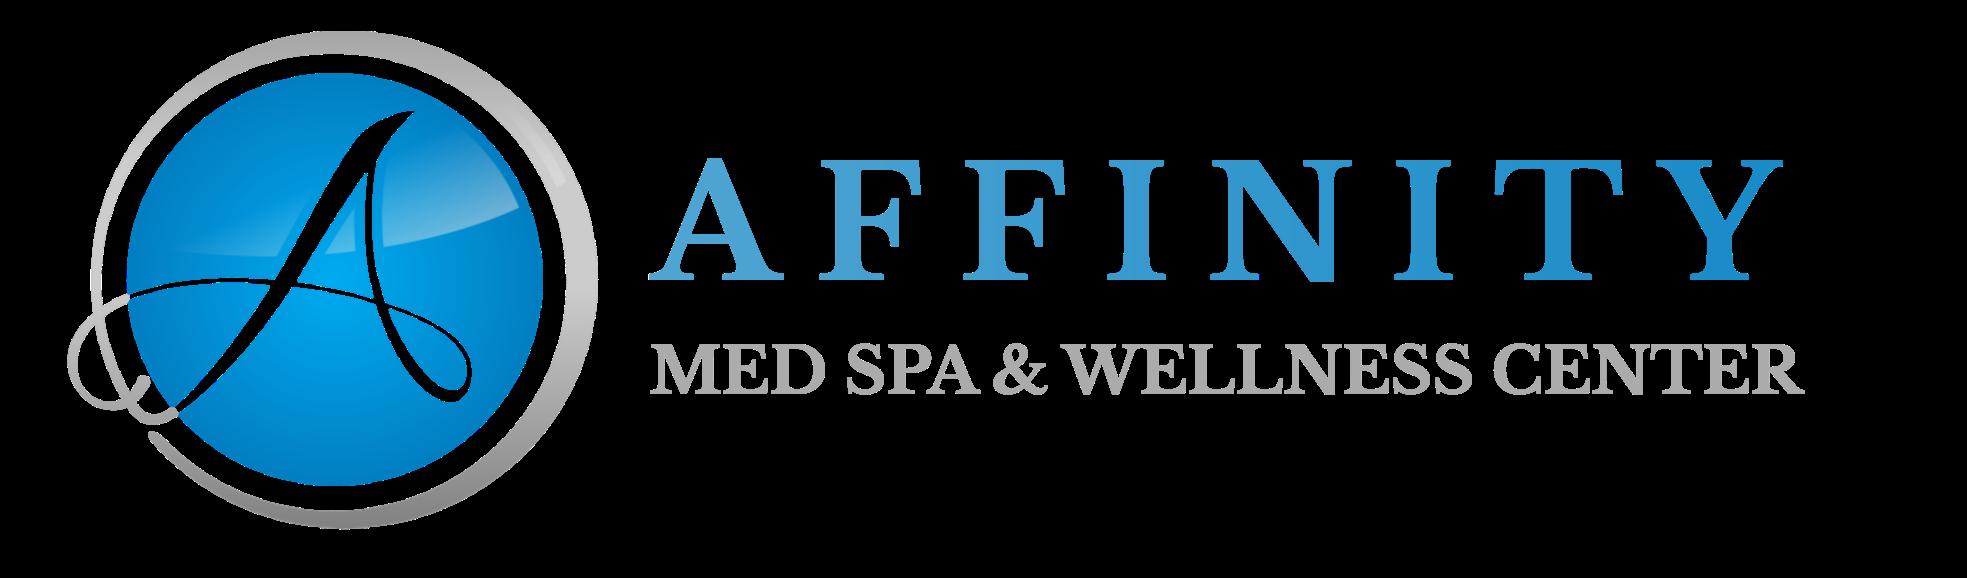 Affinity Med Spa & Wellness Center